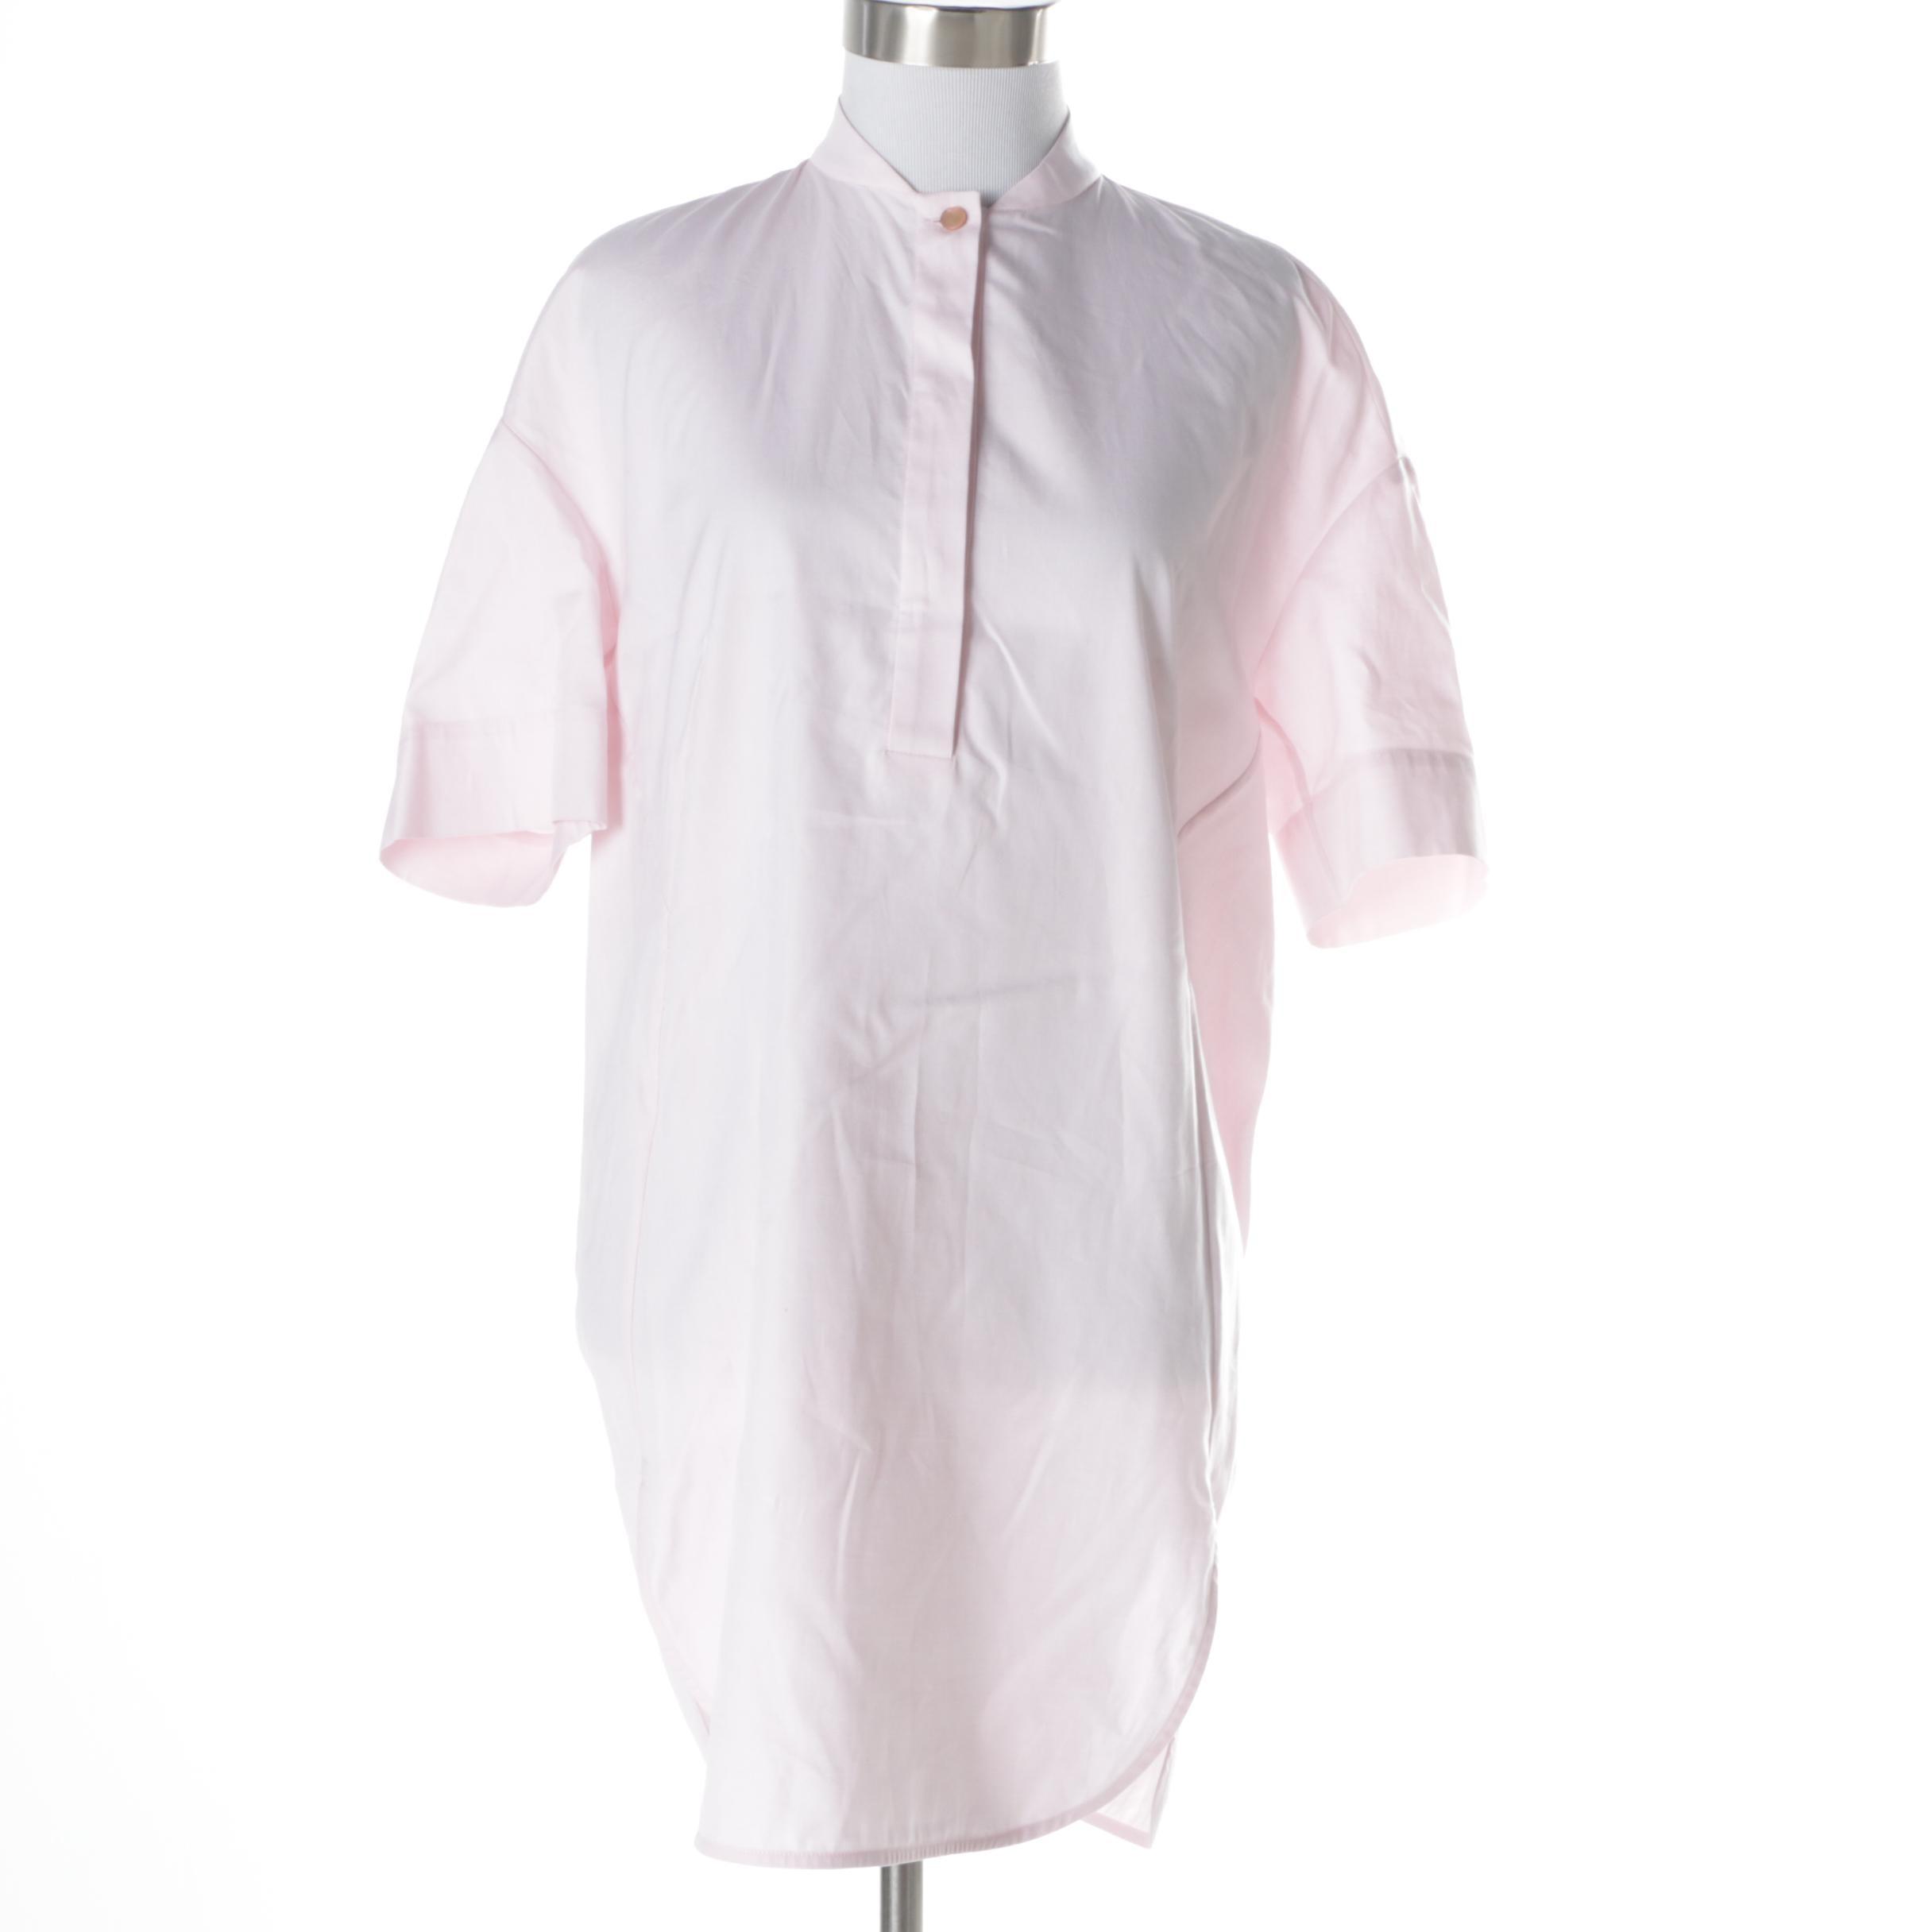 Women's Balenciga Pink Shirt